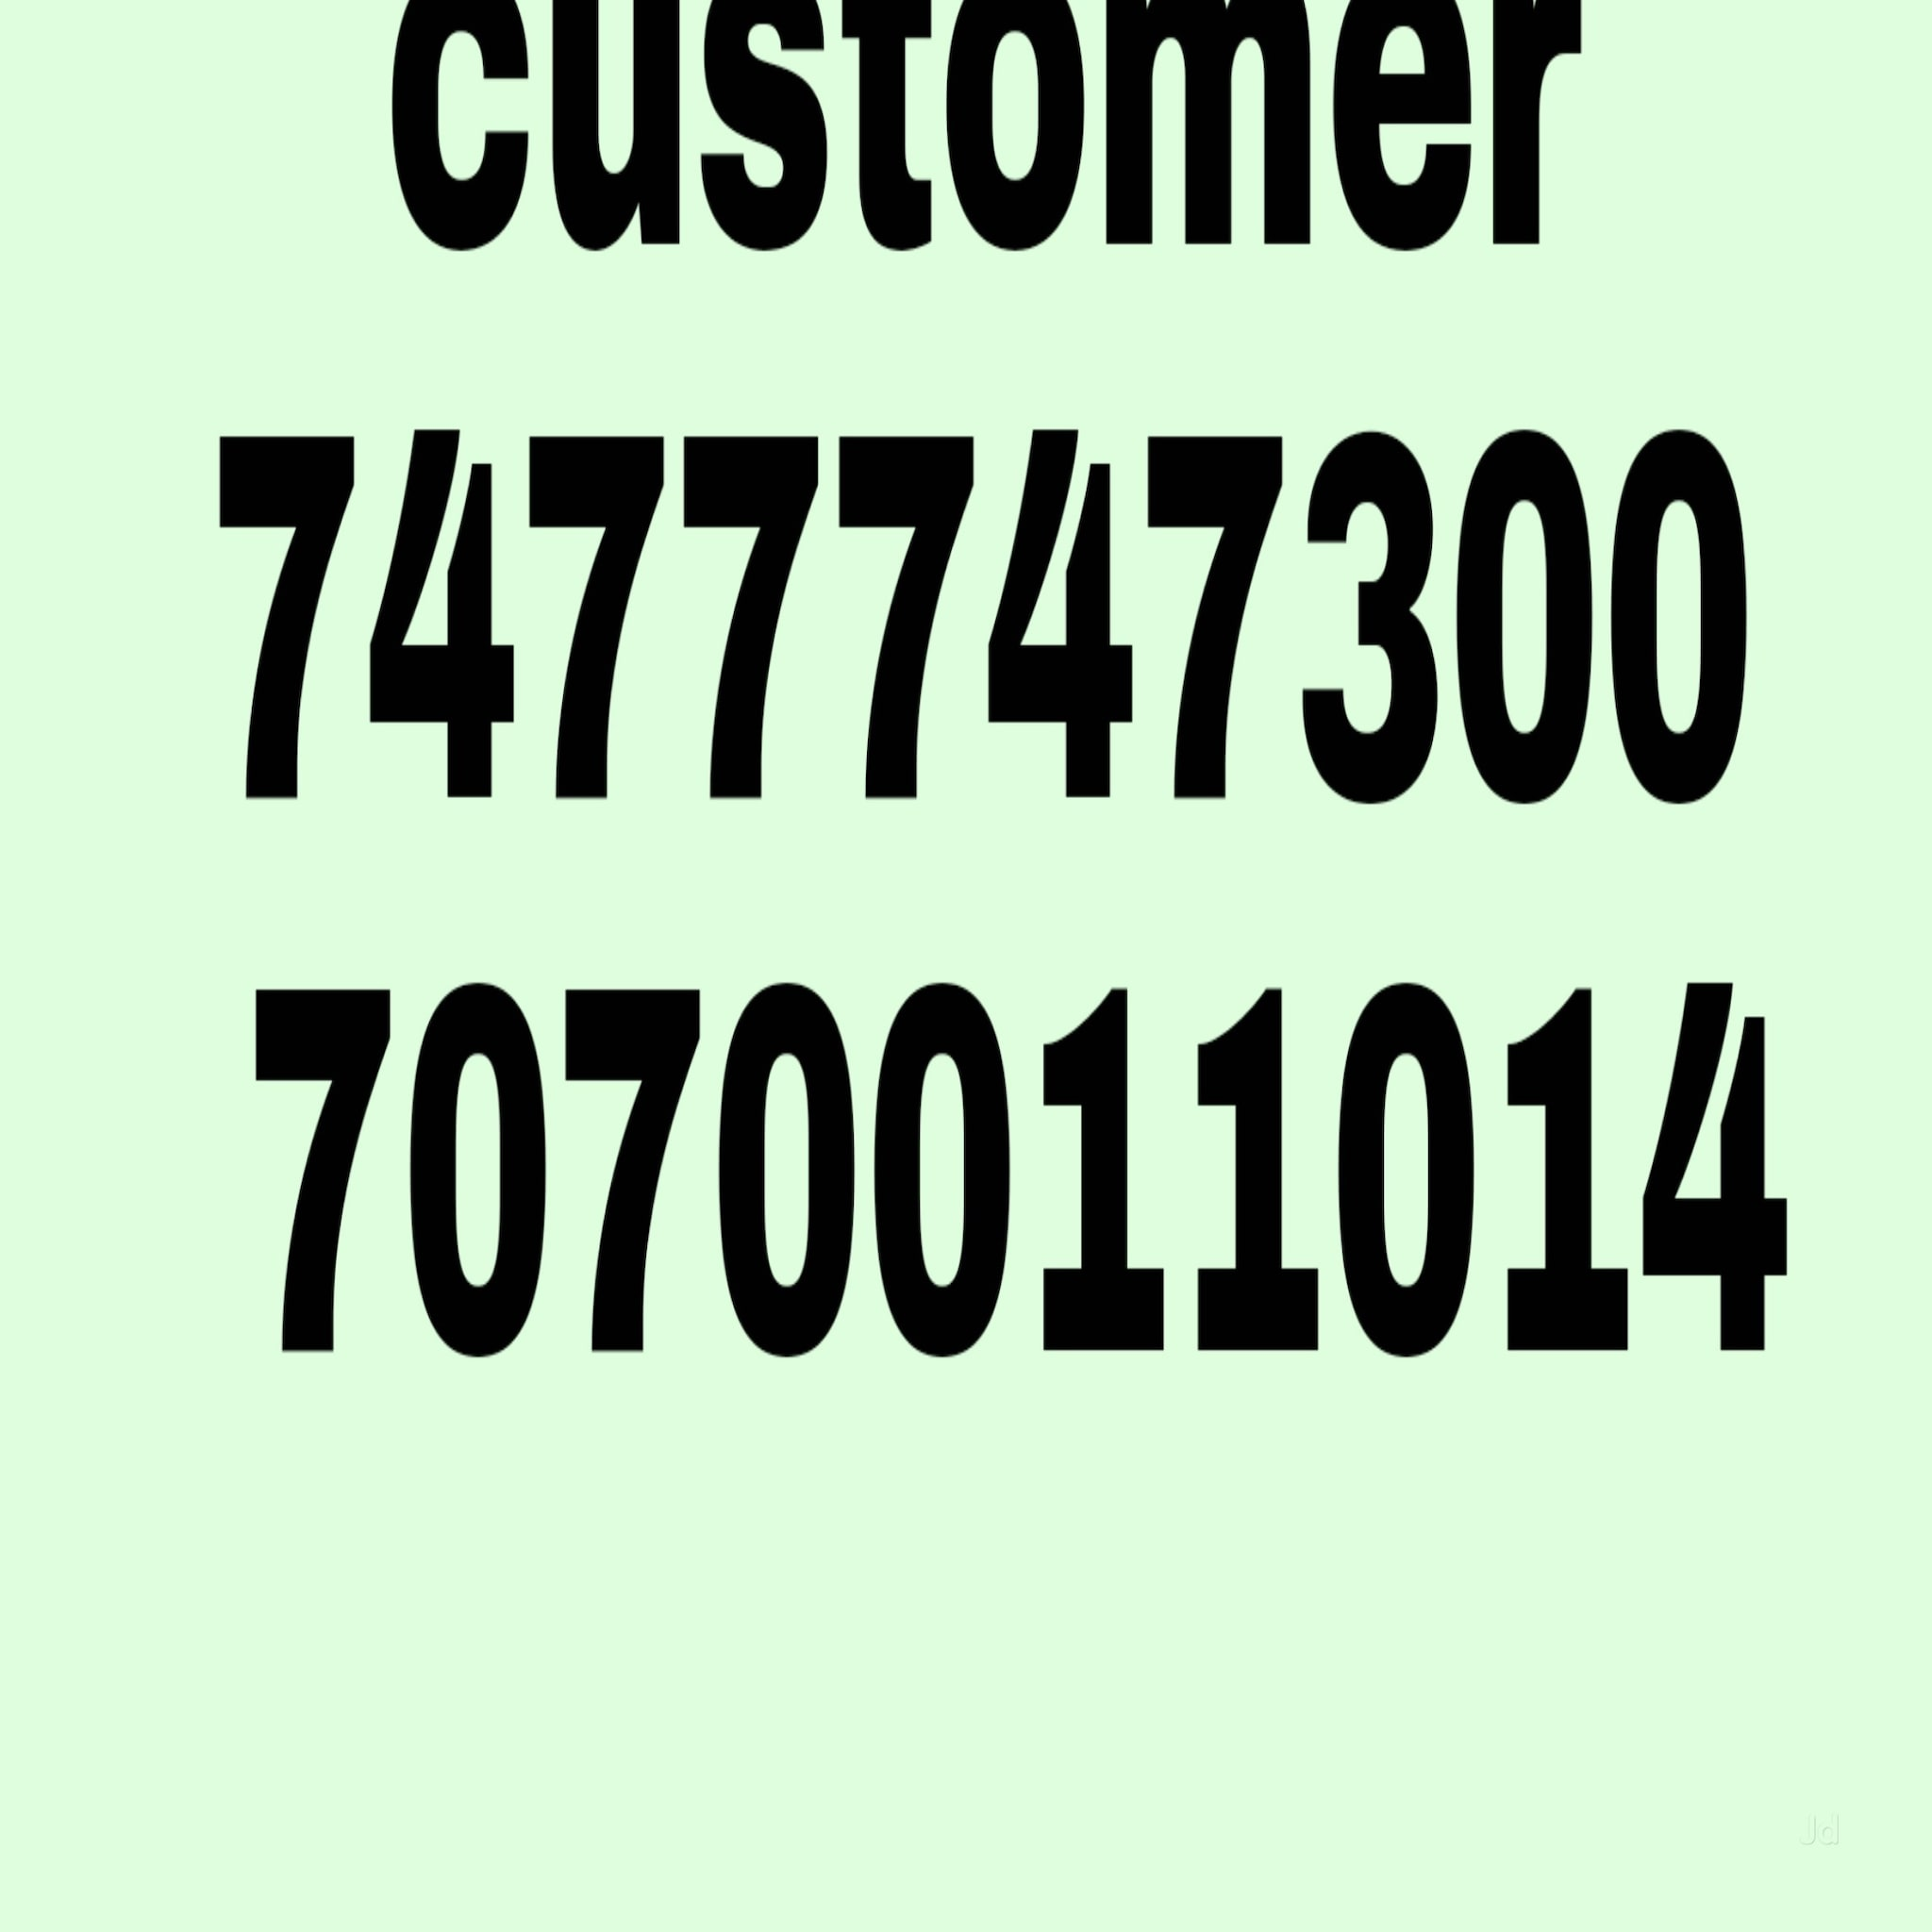 Top 30 Haldiram Food Product Distributors in Hosur Road